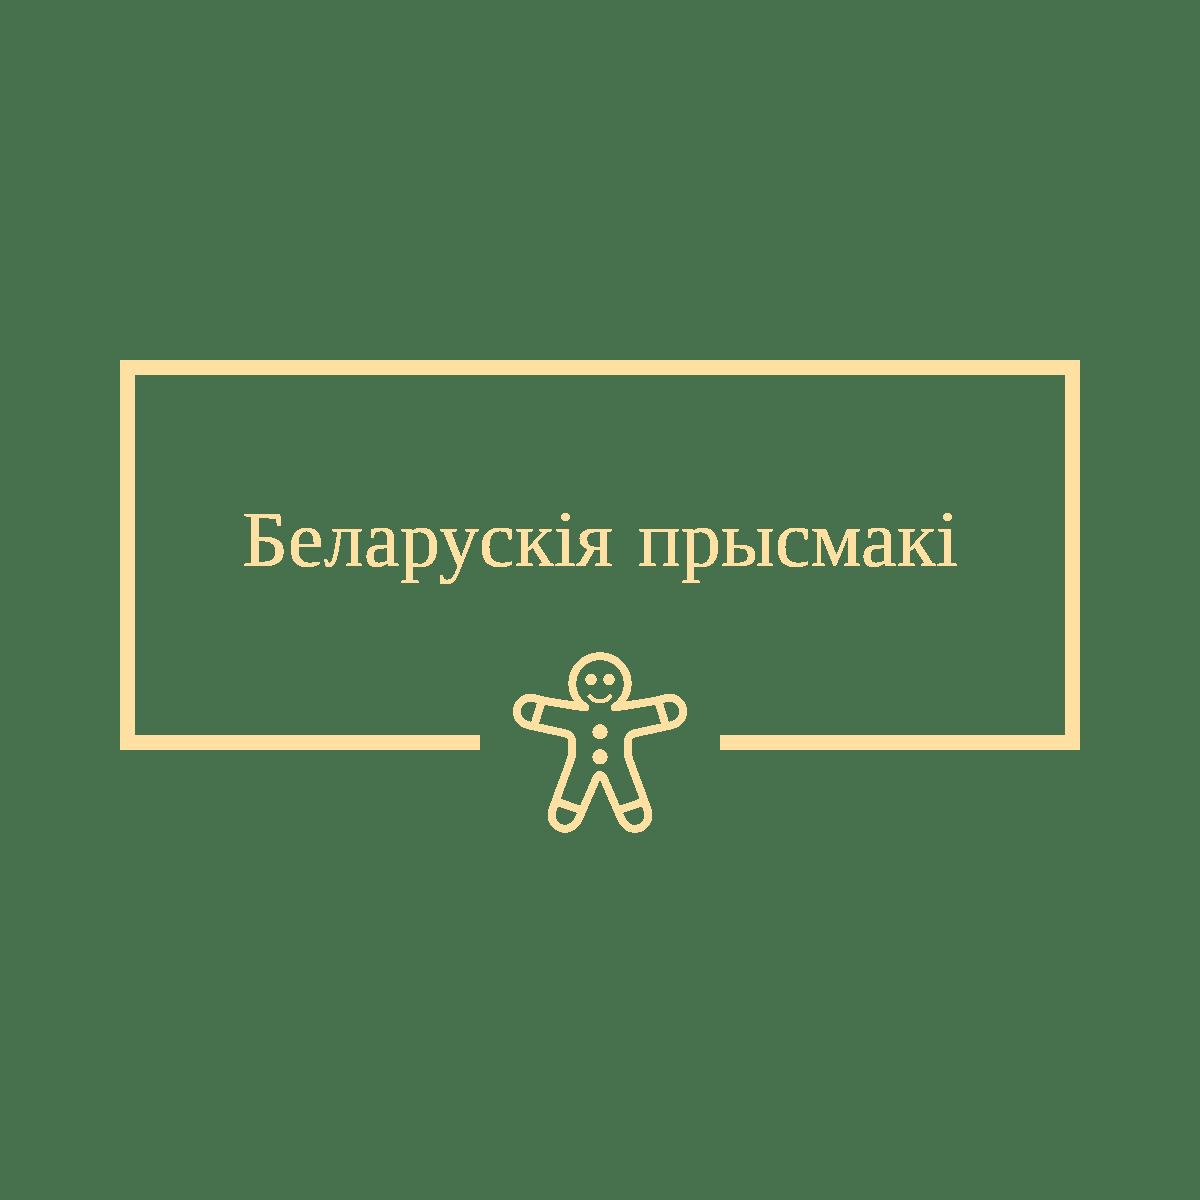 Беларускiя прысмакi